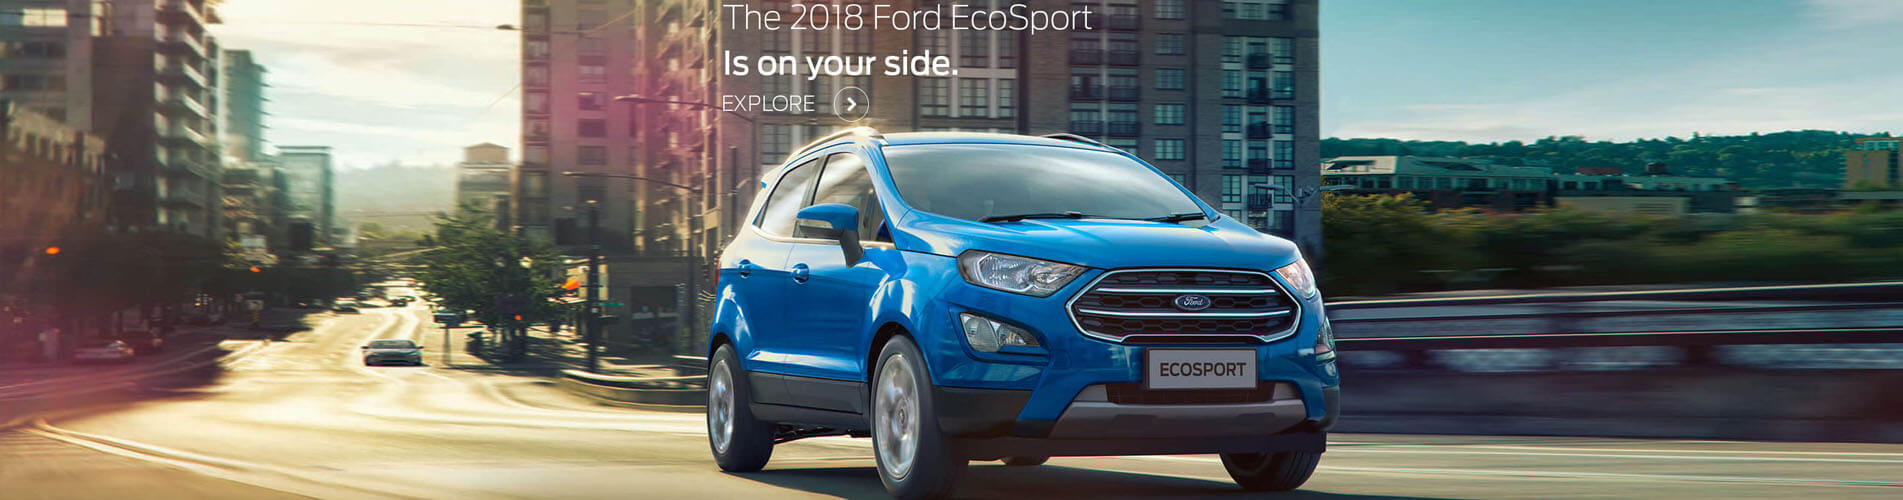 Ford Dealer Shepparton - Darryl Twitt Ford